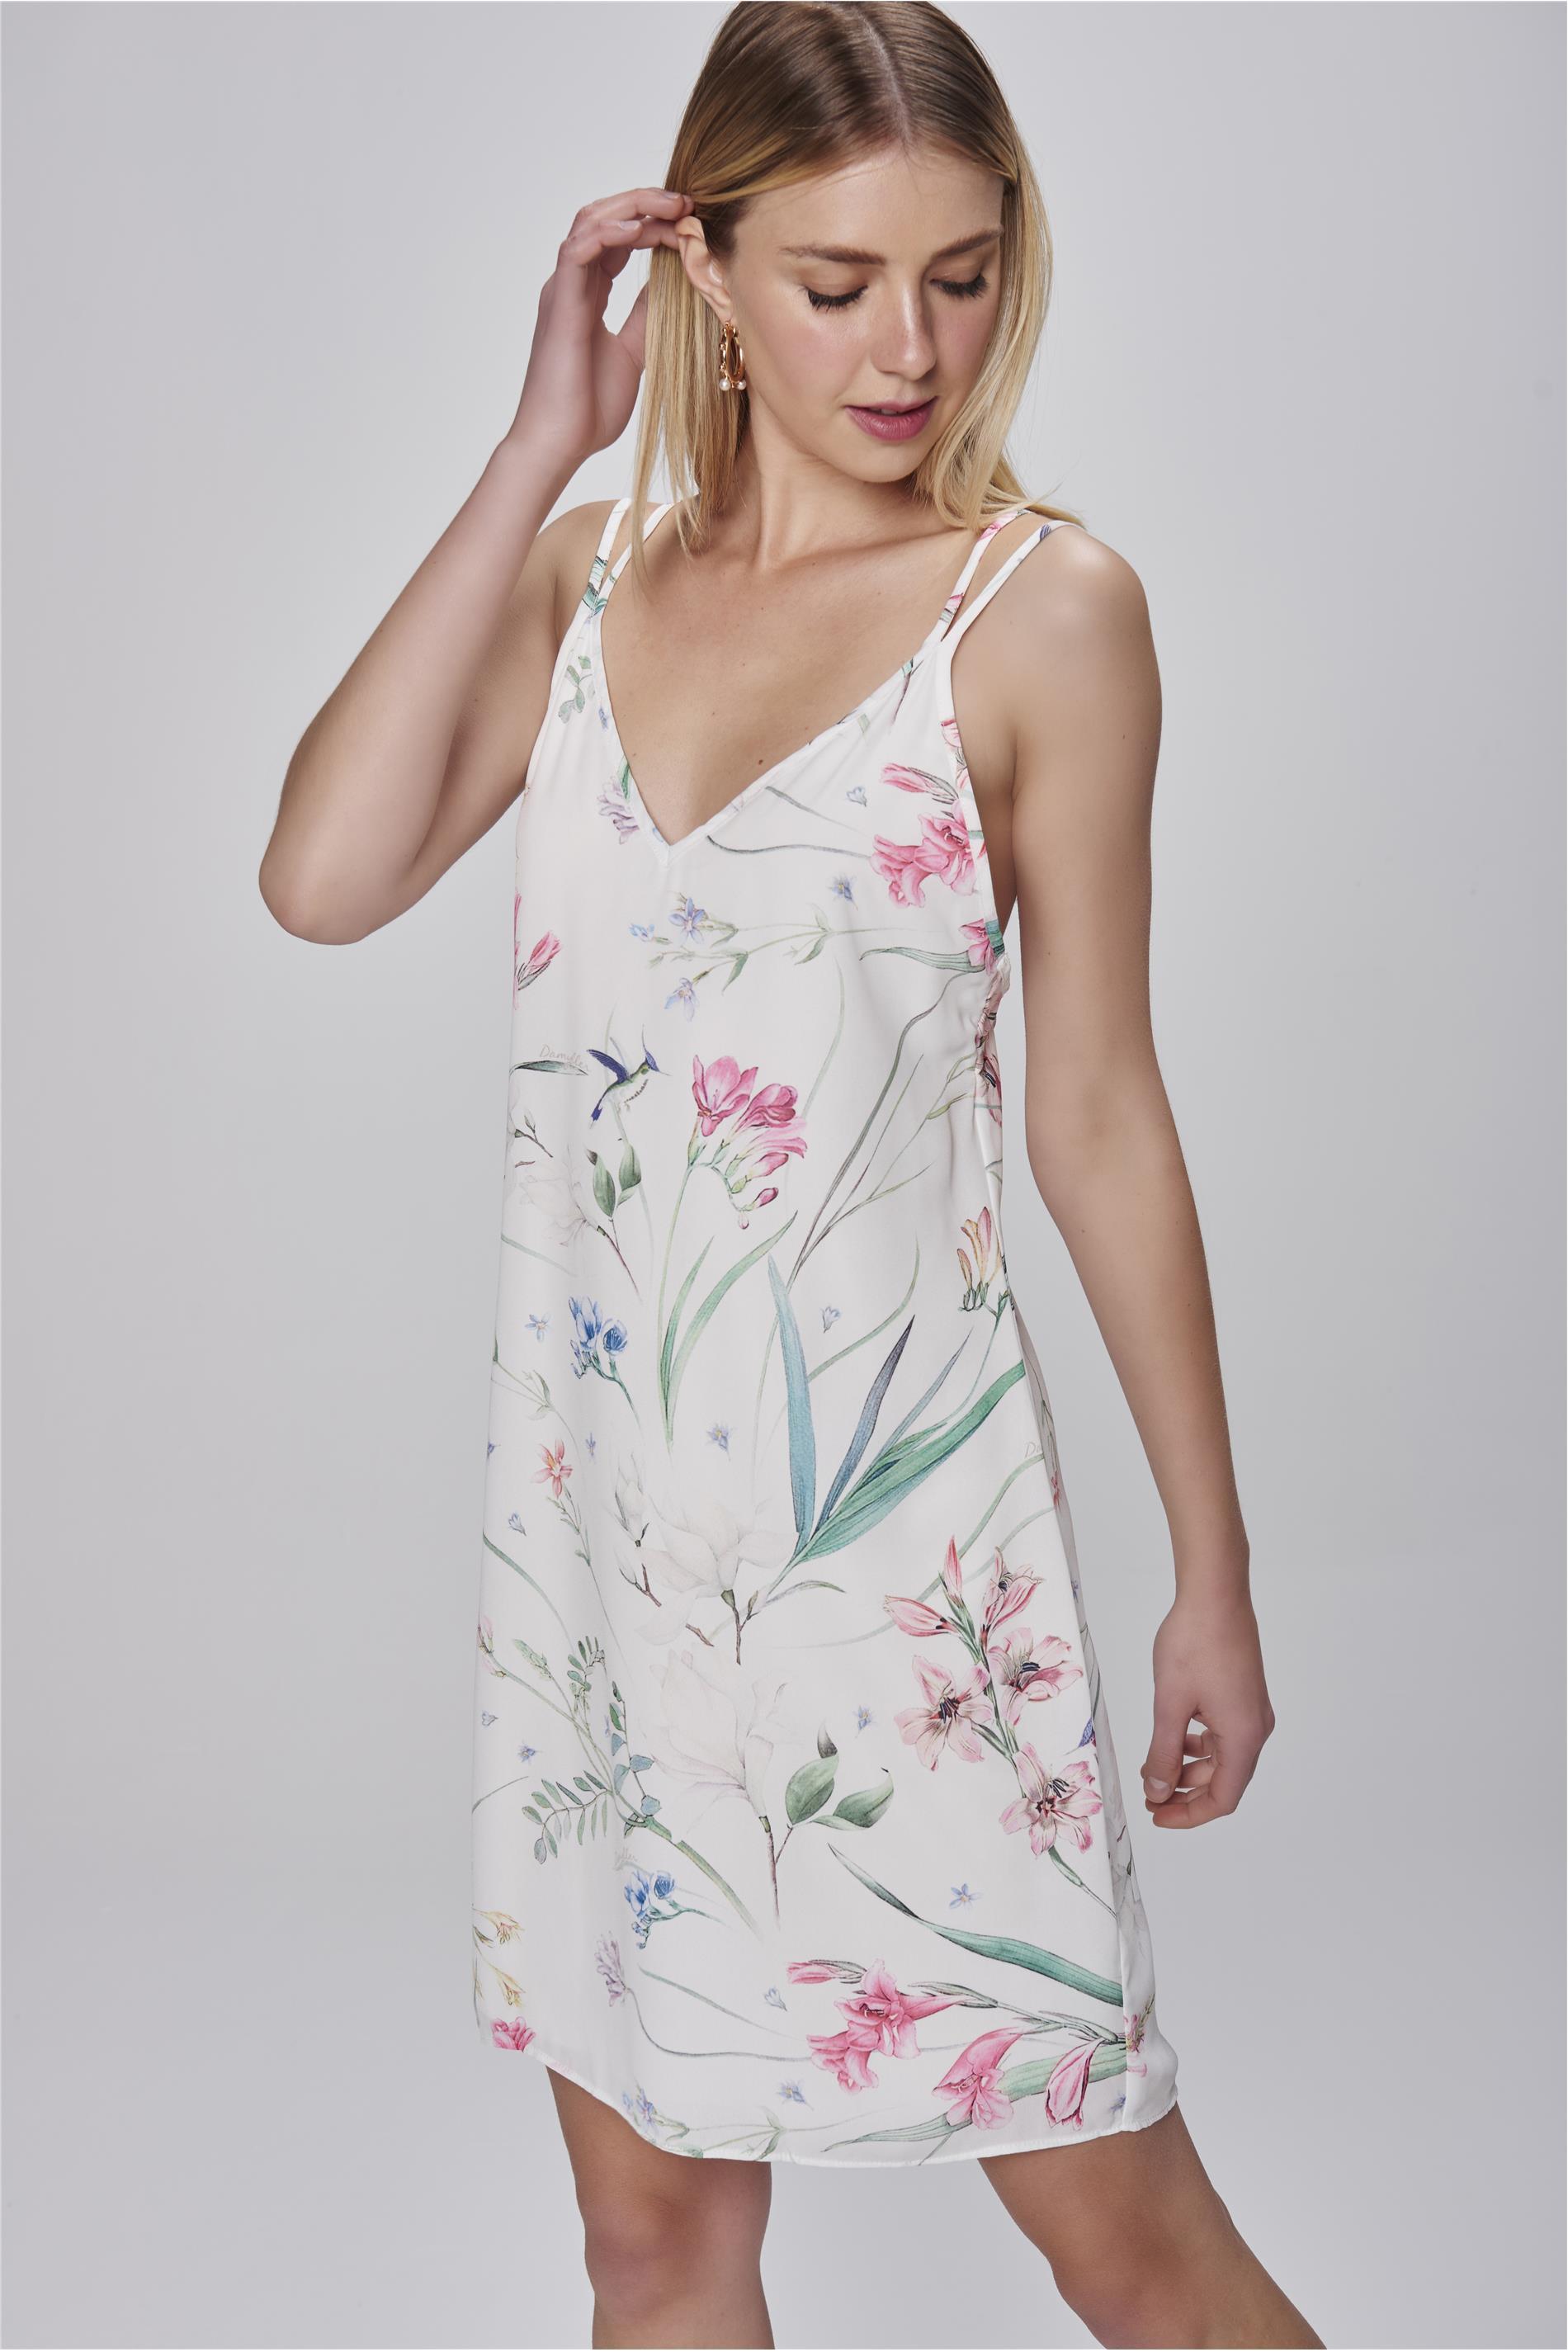 4cb40767e1 Vestido de Alça Estampa Floral - Damyller